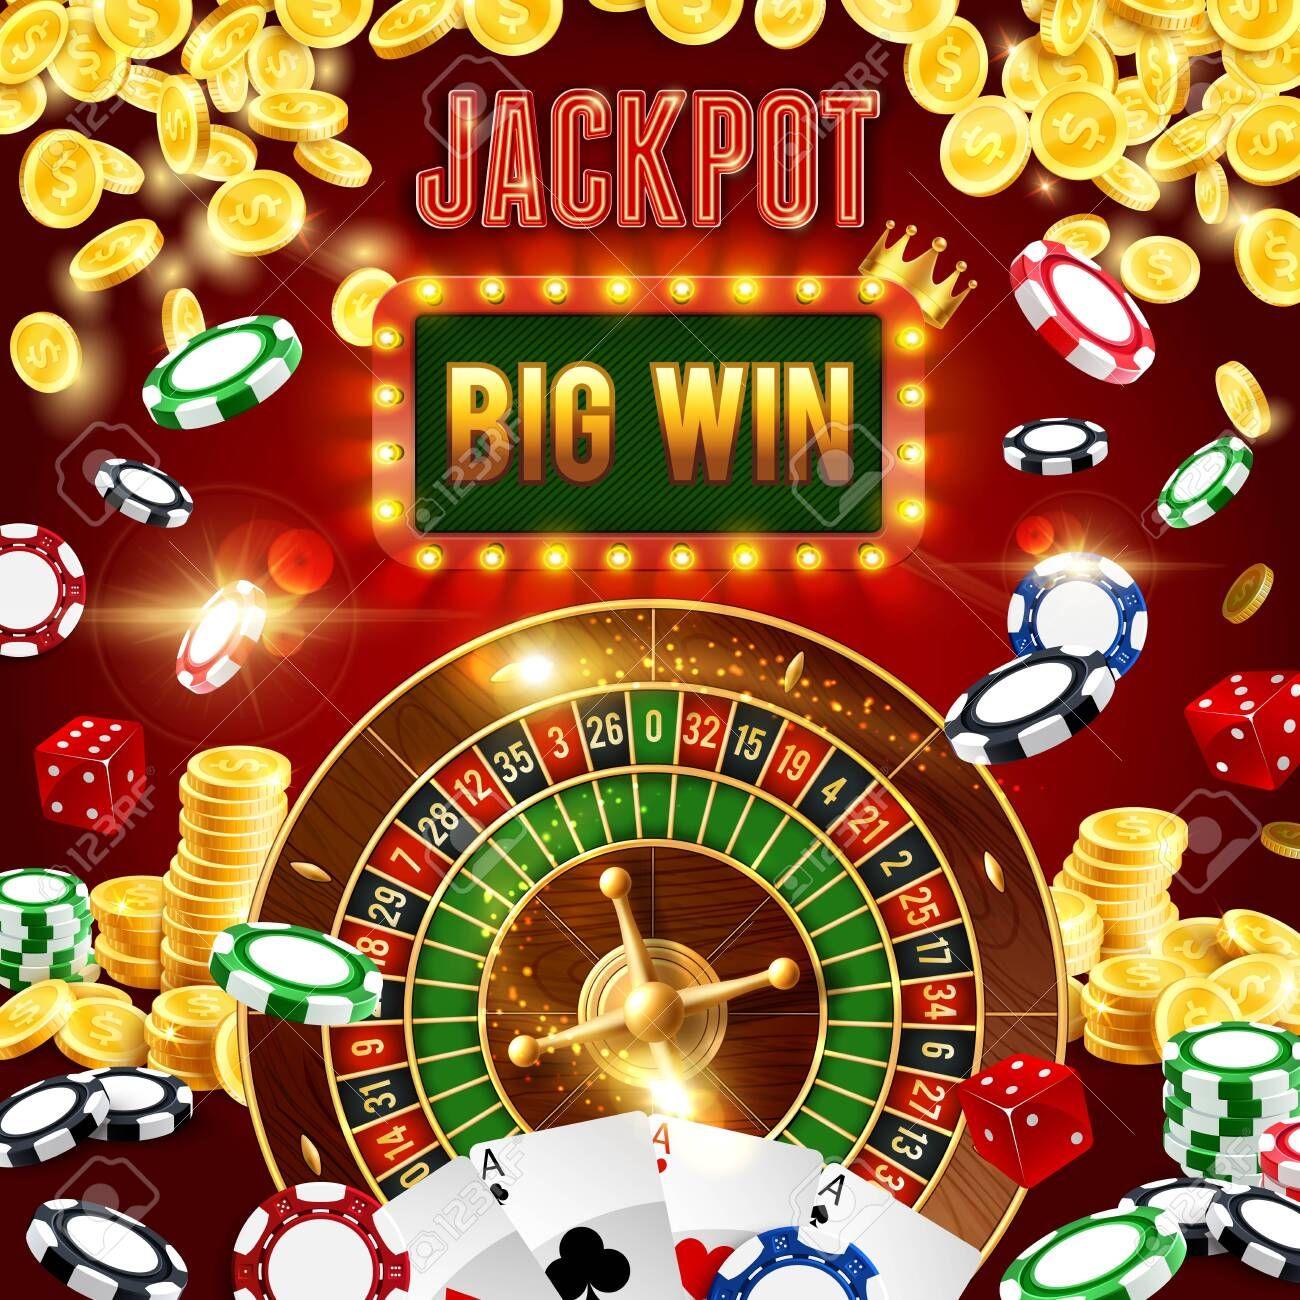 Wheel Of Fortune Jackpot Big Win Casino Poker Club Cash Golden